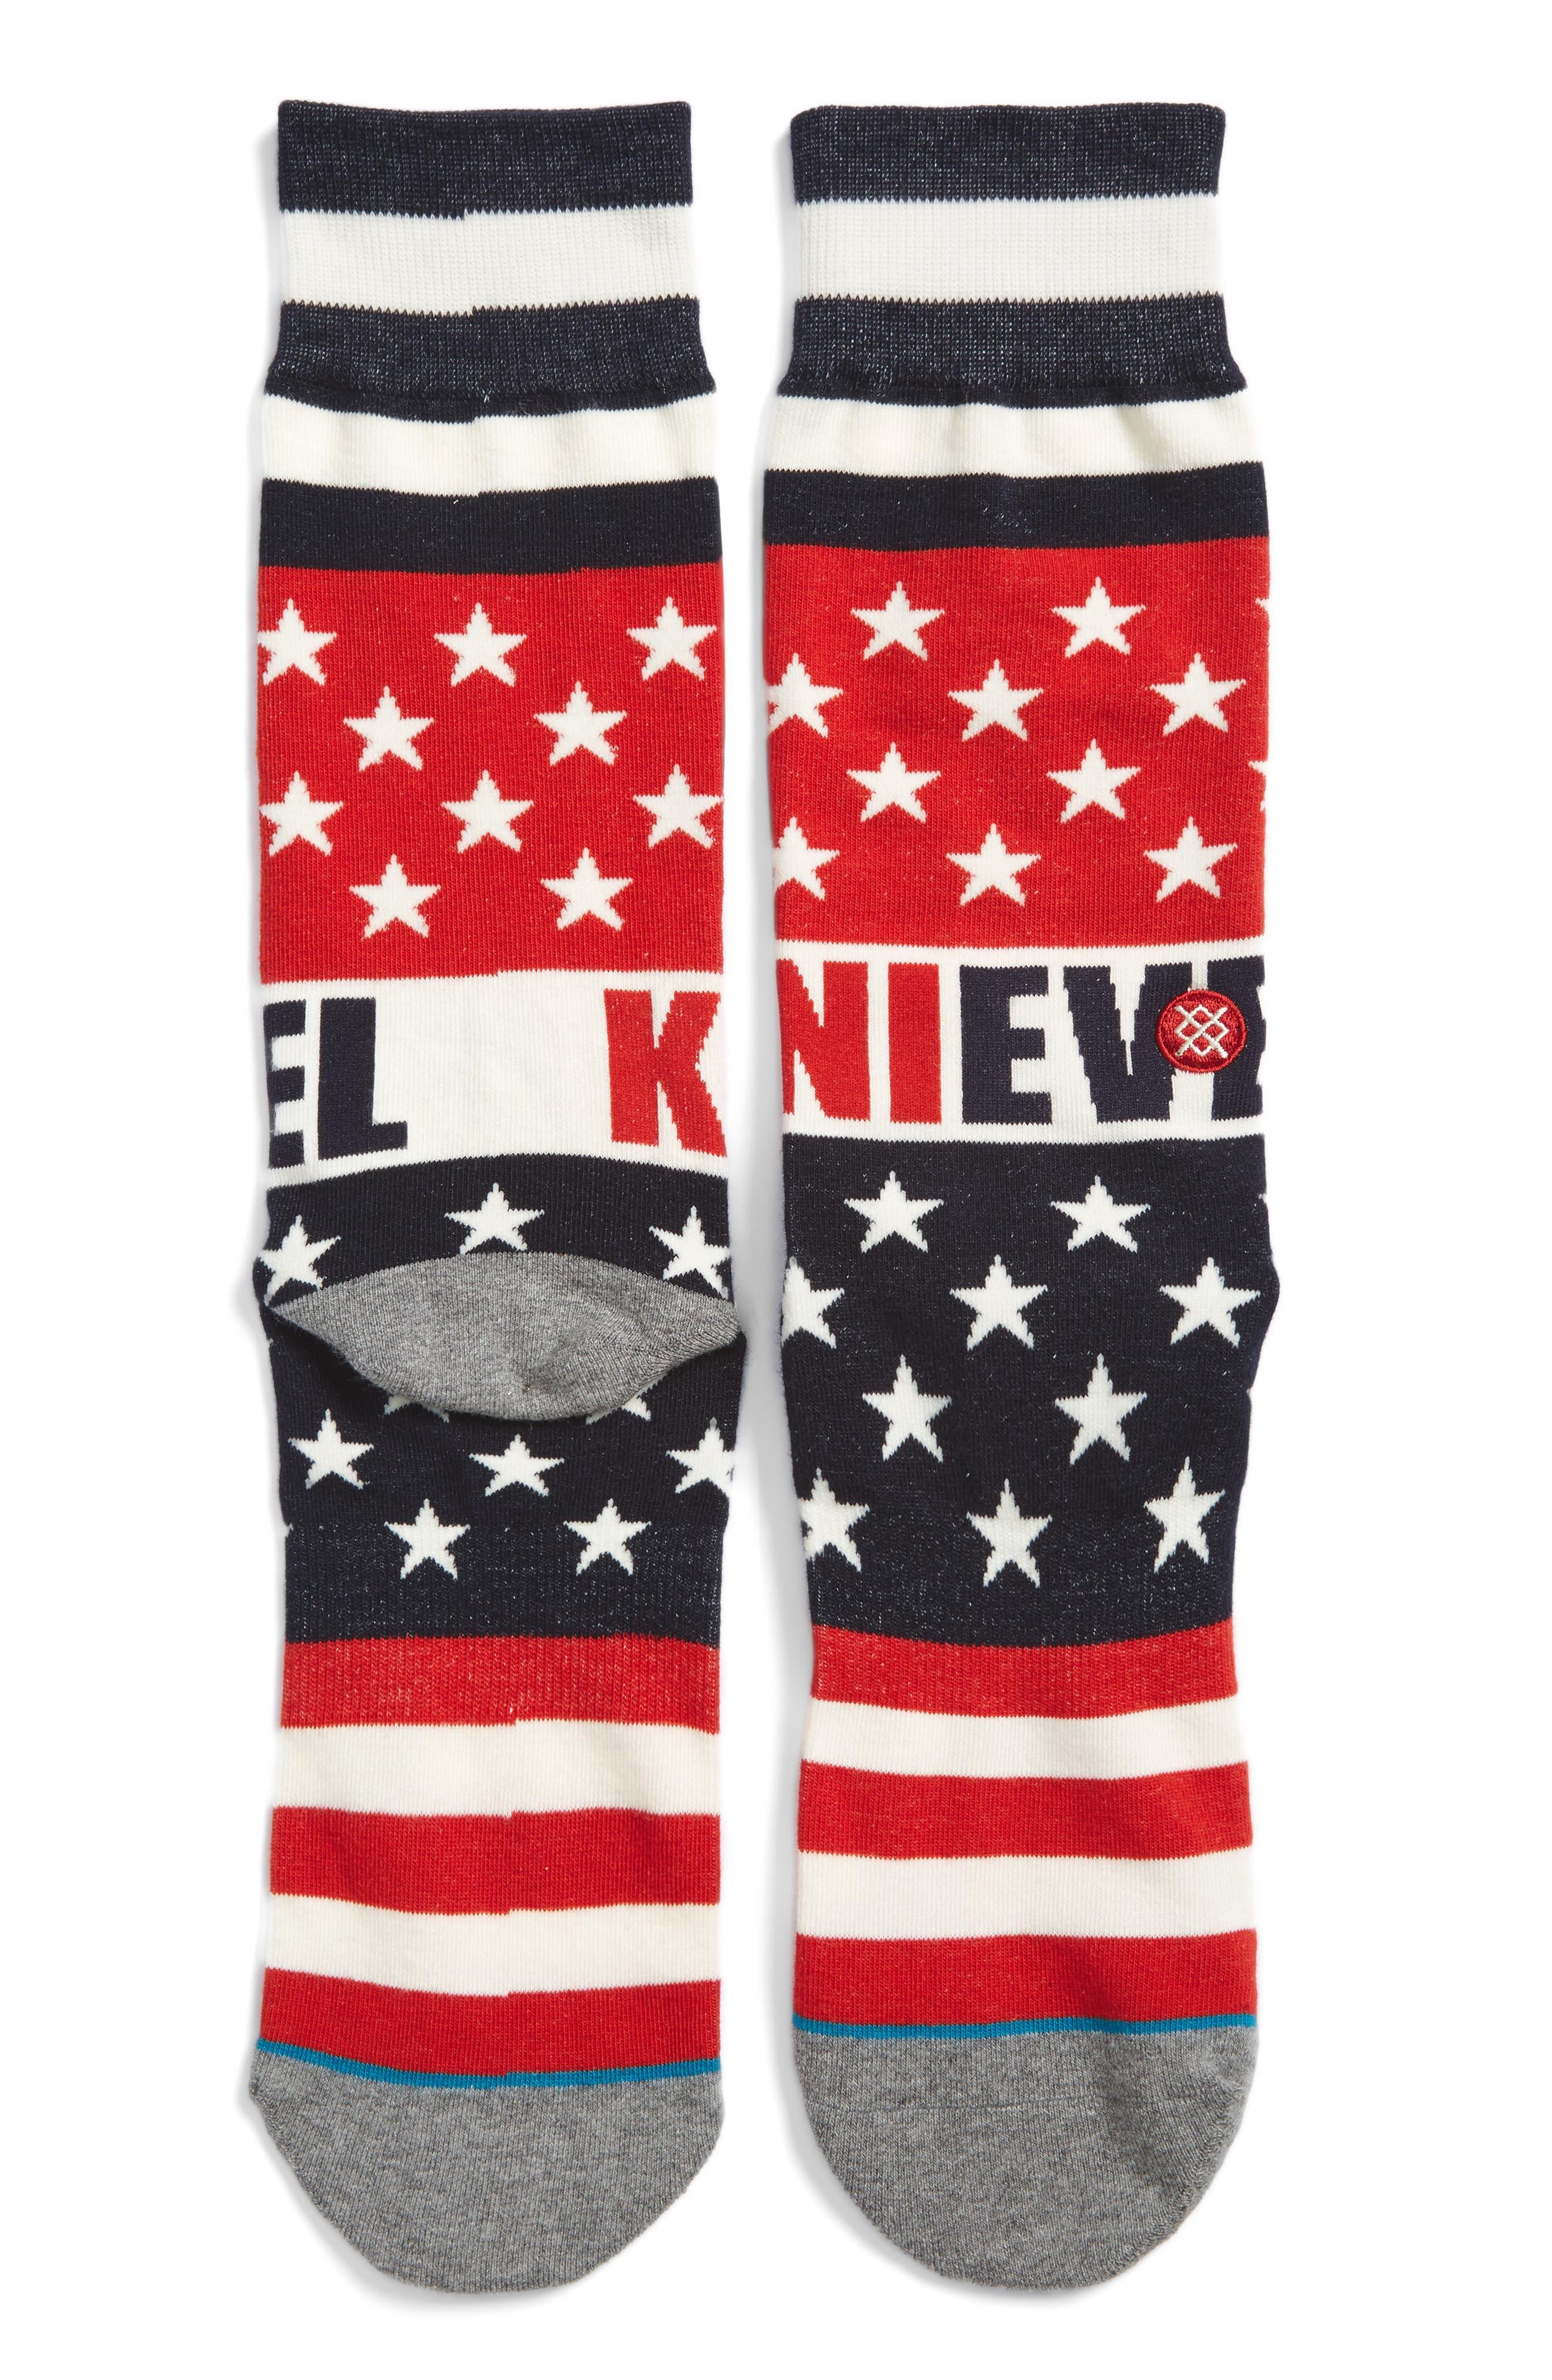 Evel Knievel x Stance Gladiator Socks